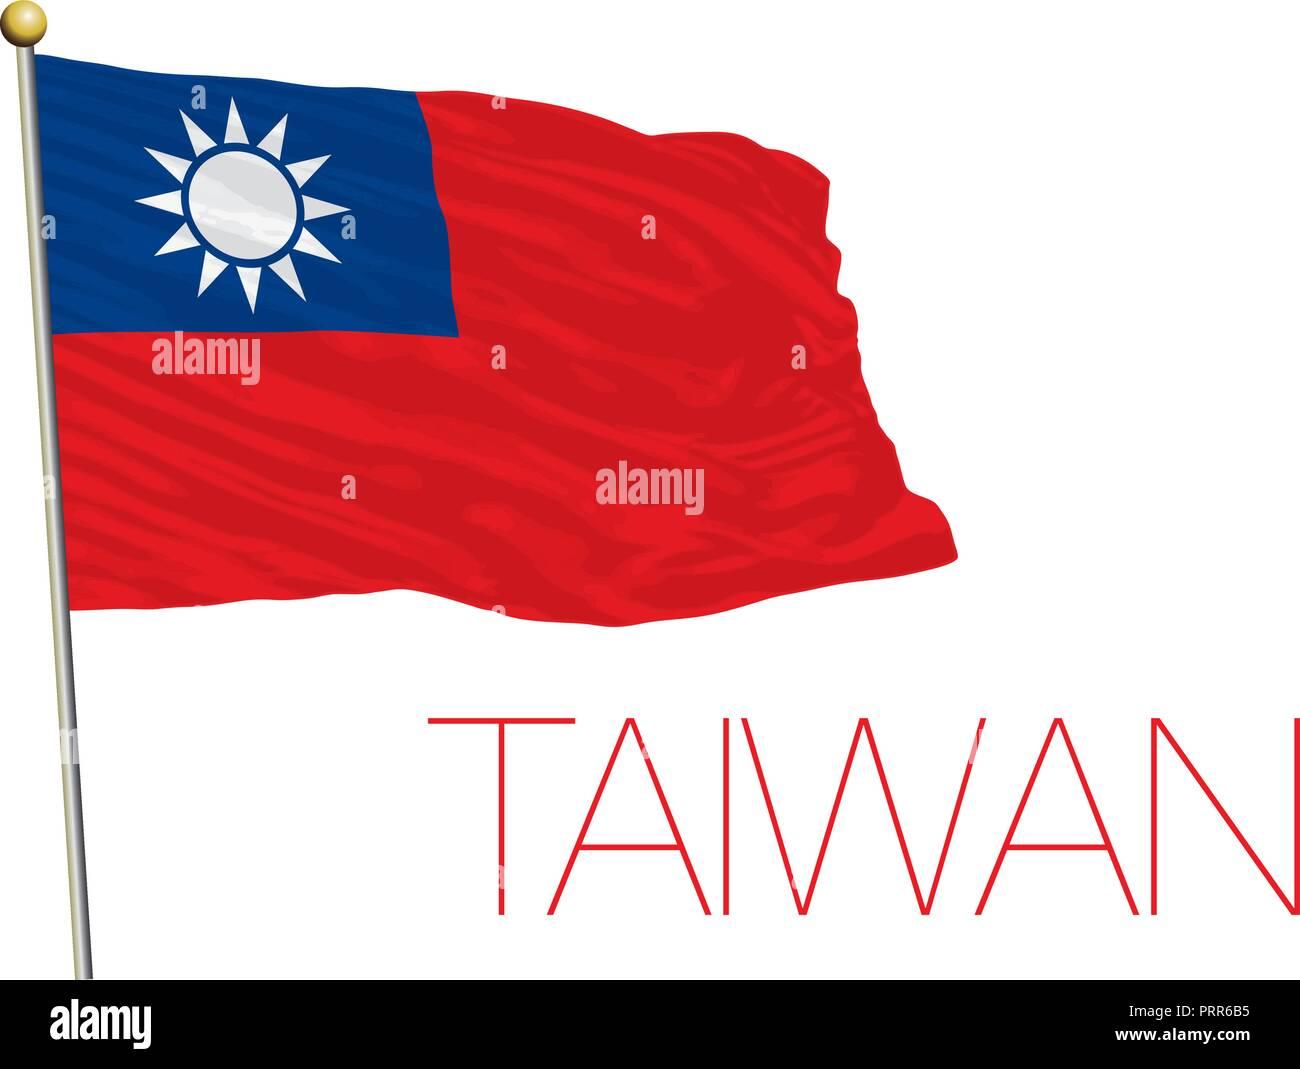 Taiwan official flag, vector illustration - Stock Vector